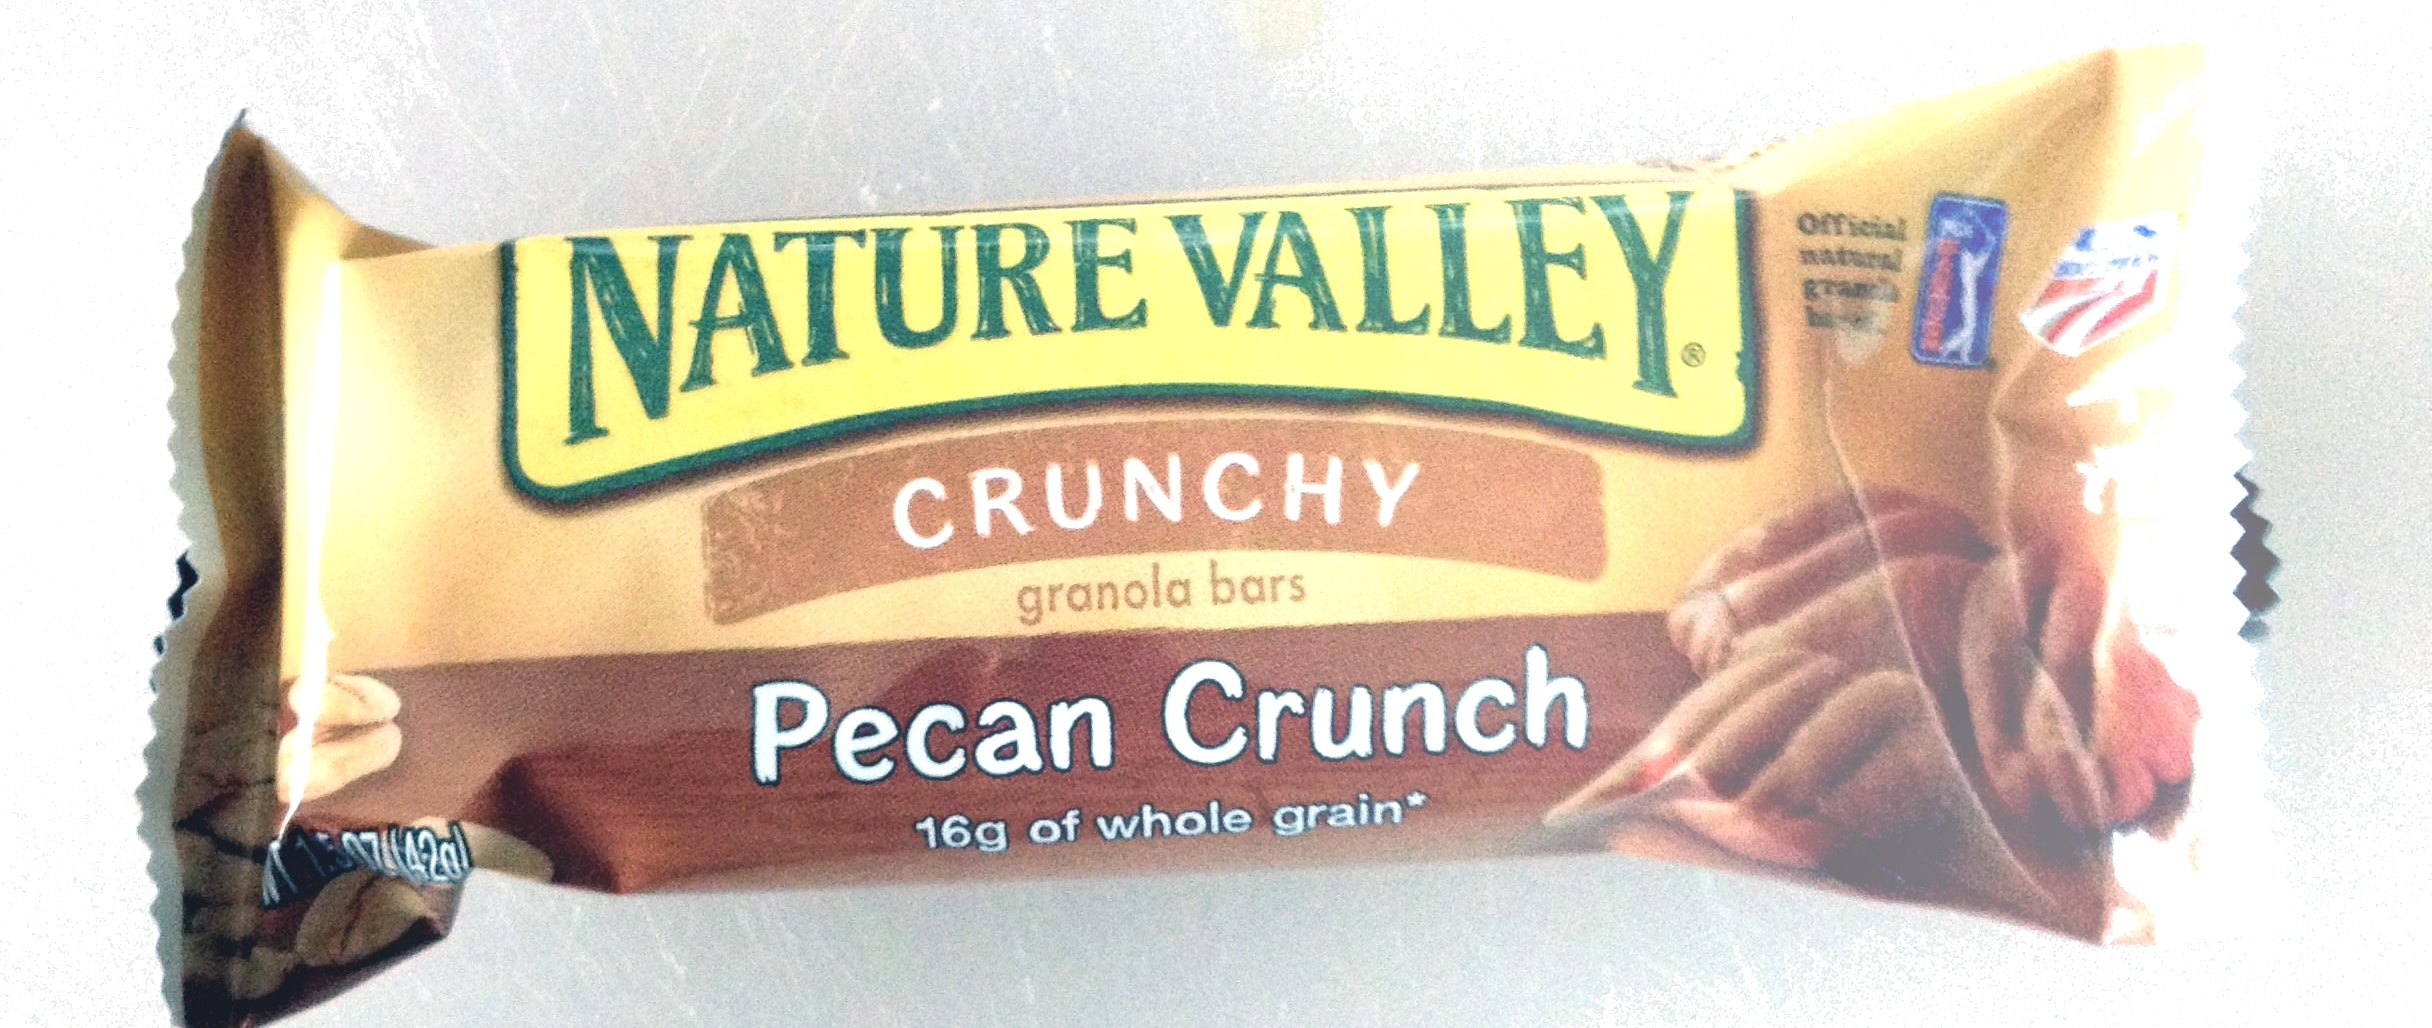 Pecan Crunch - Product